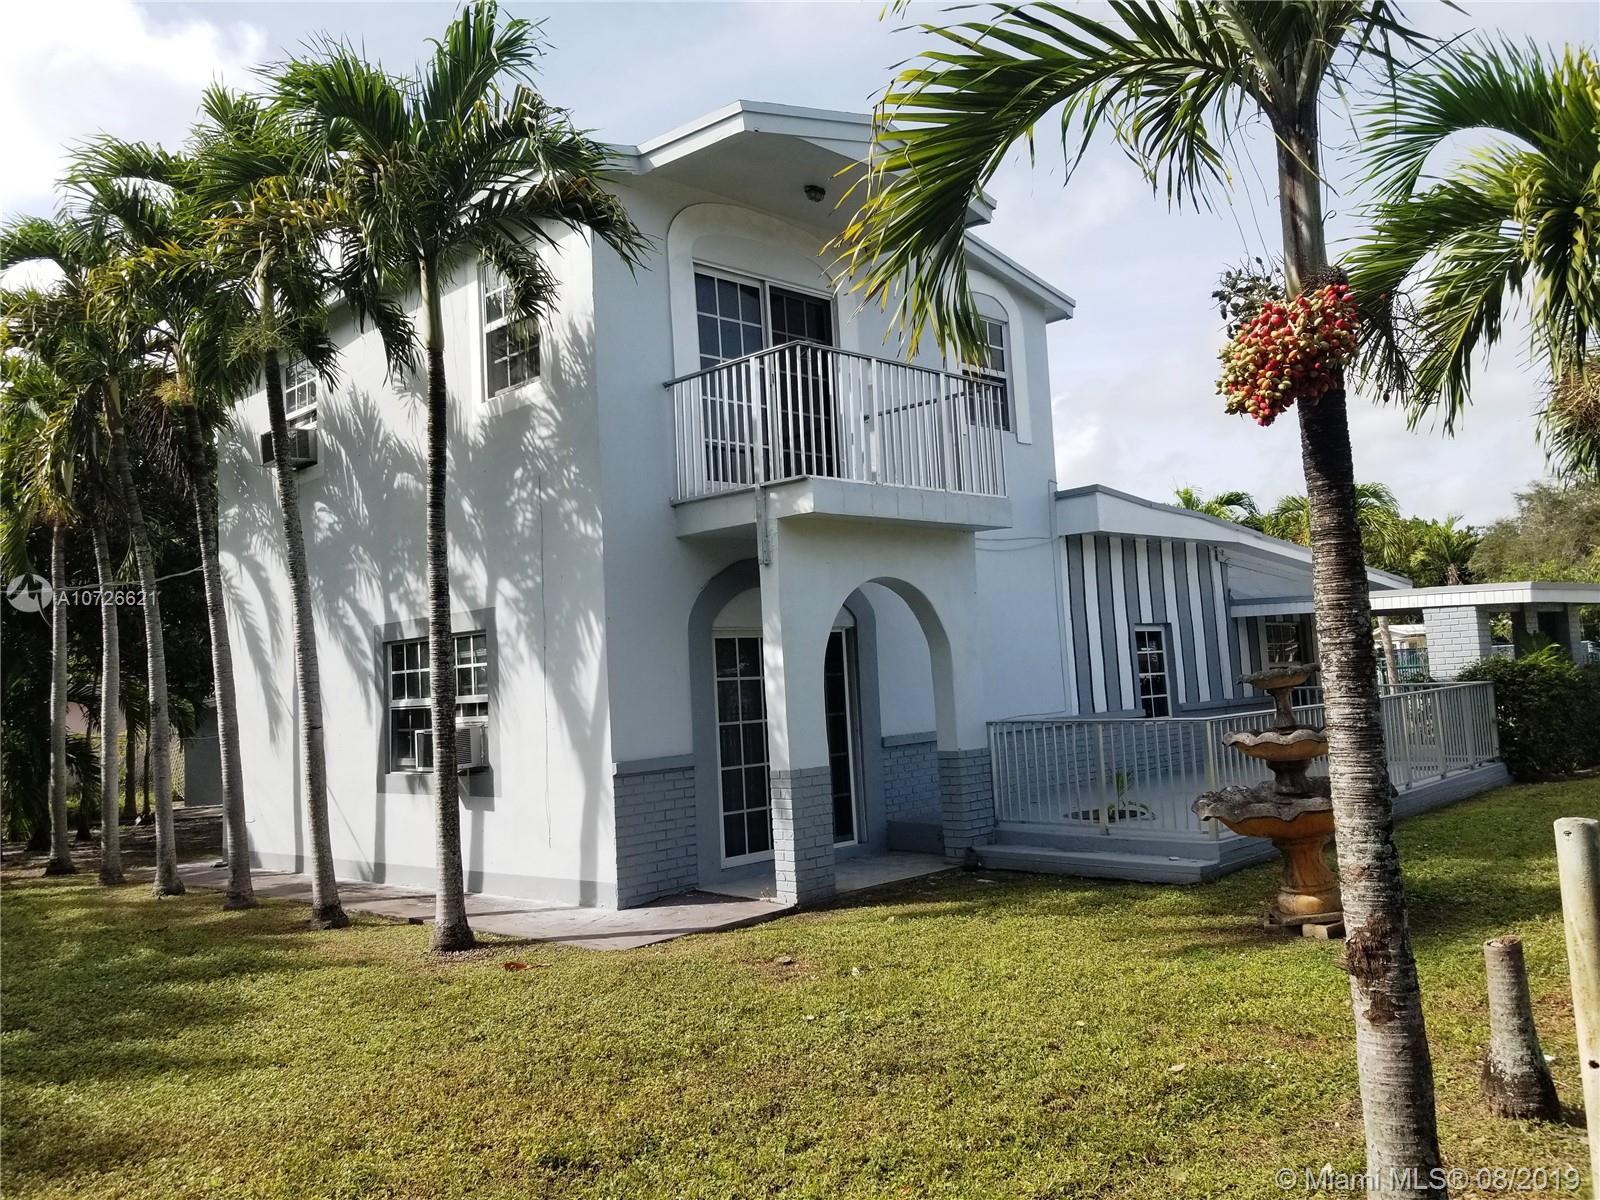 290 NW 136th St, Miami Shores, Florida